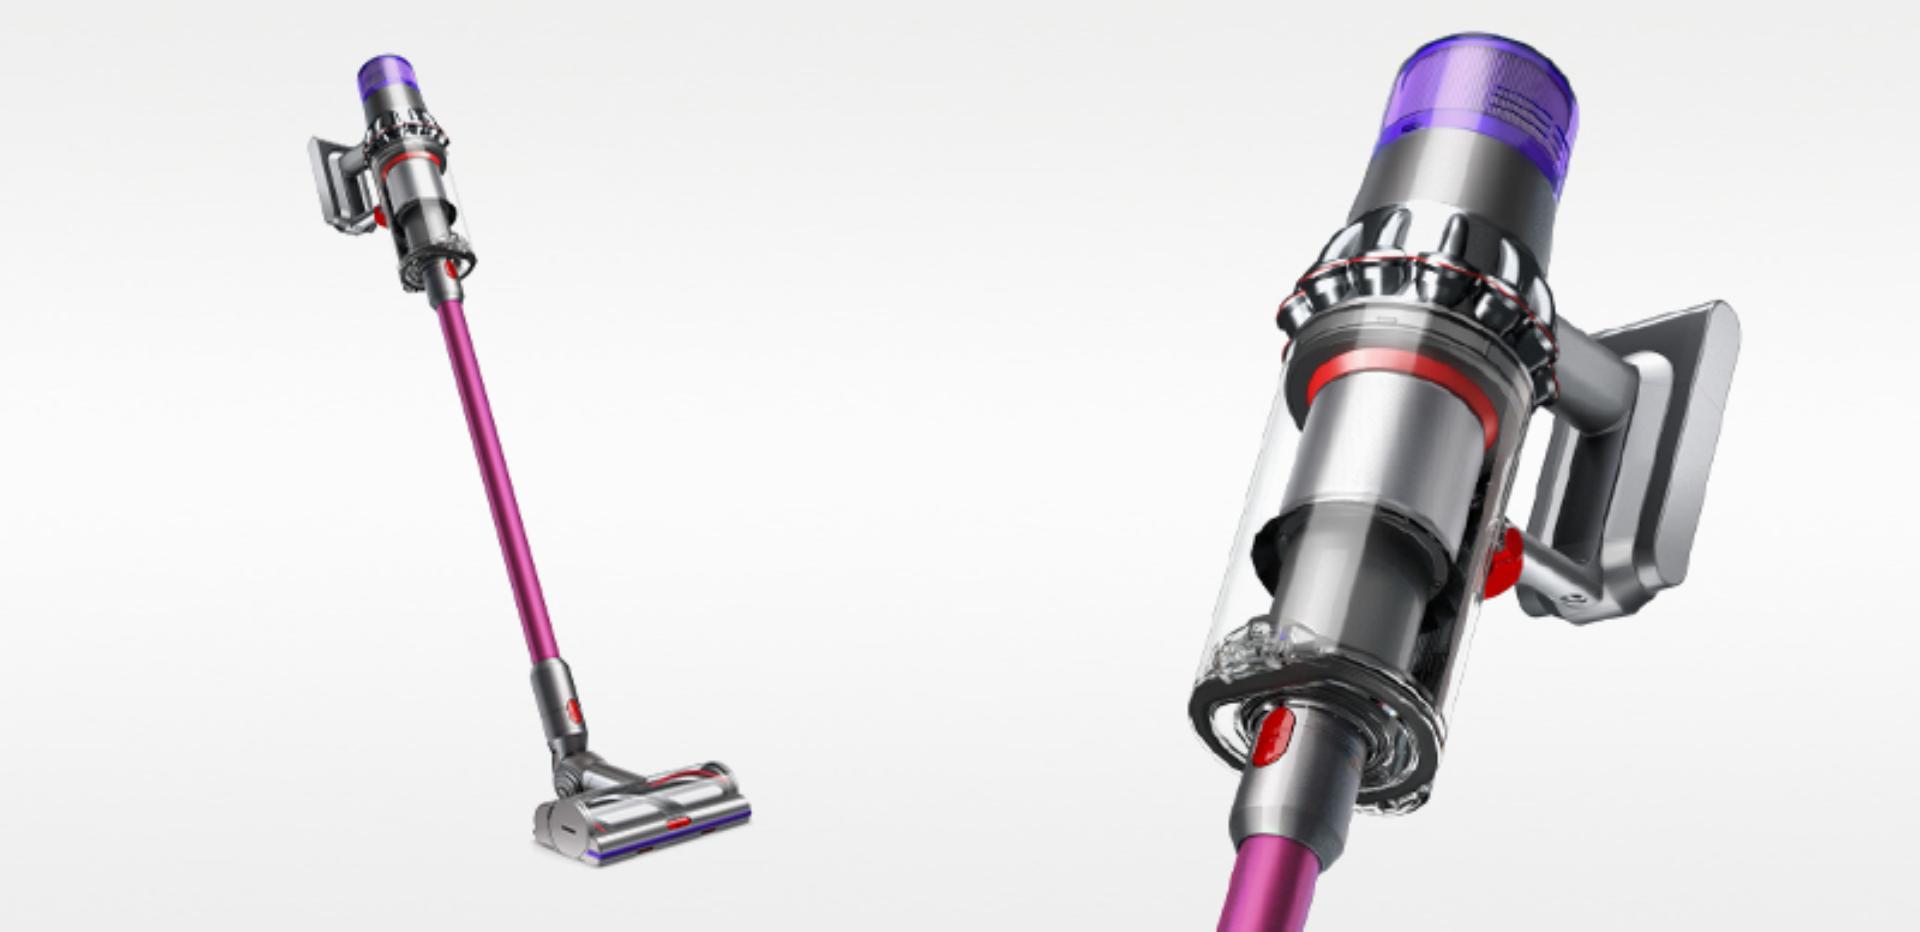 Image showing Dyson V11 Torque Drive cordless vacuum